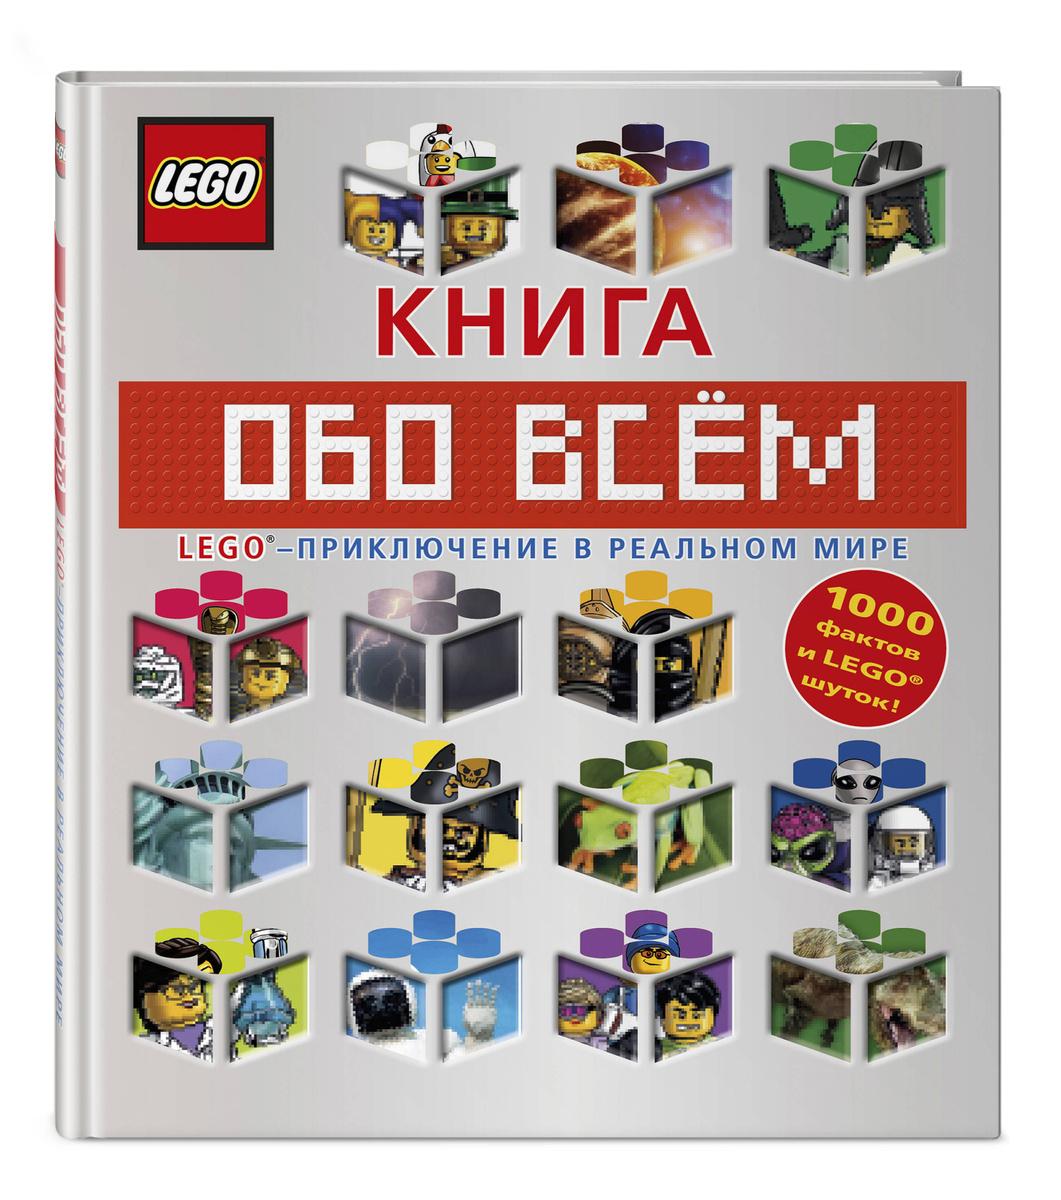 LEGO Книга обо всем / LEGO Book of Everything   Нет автора #1